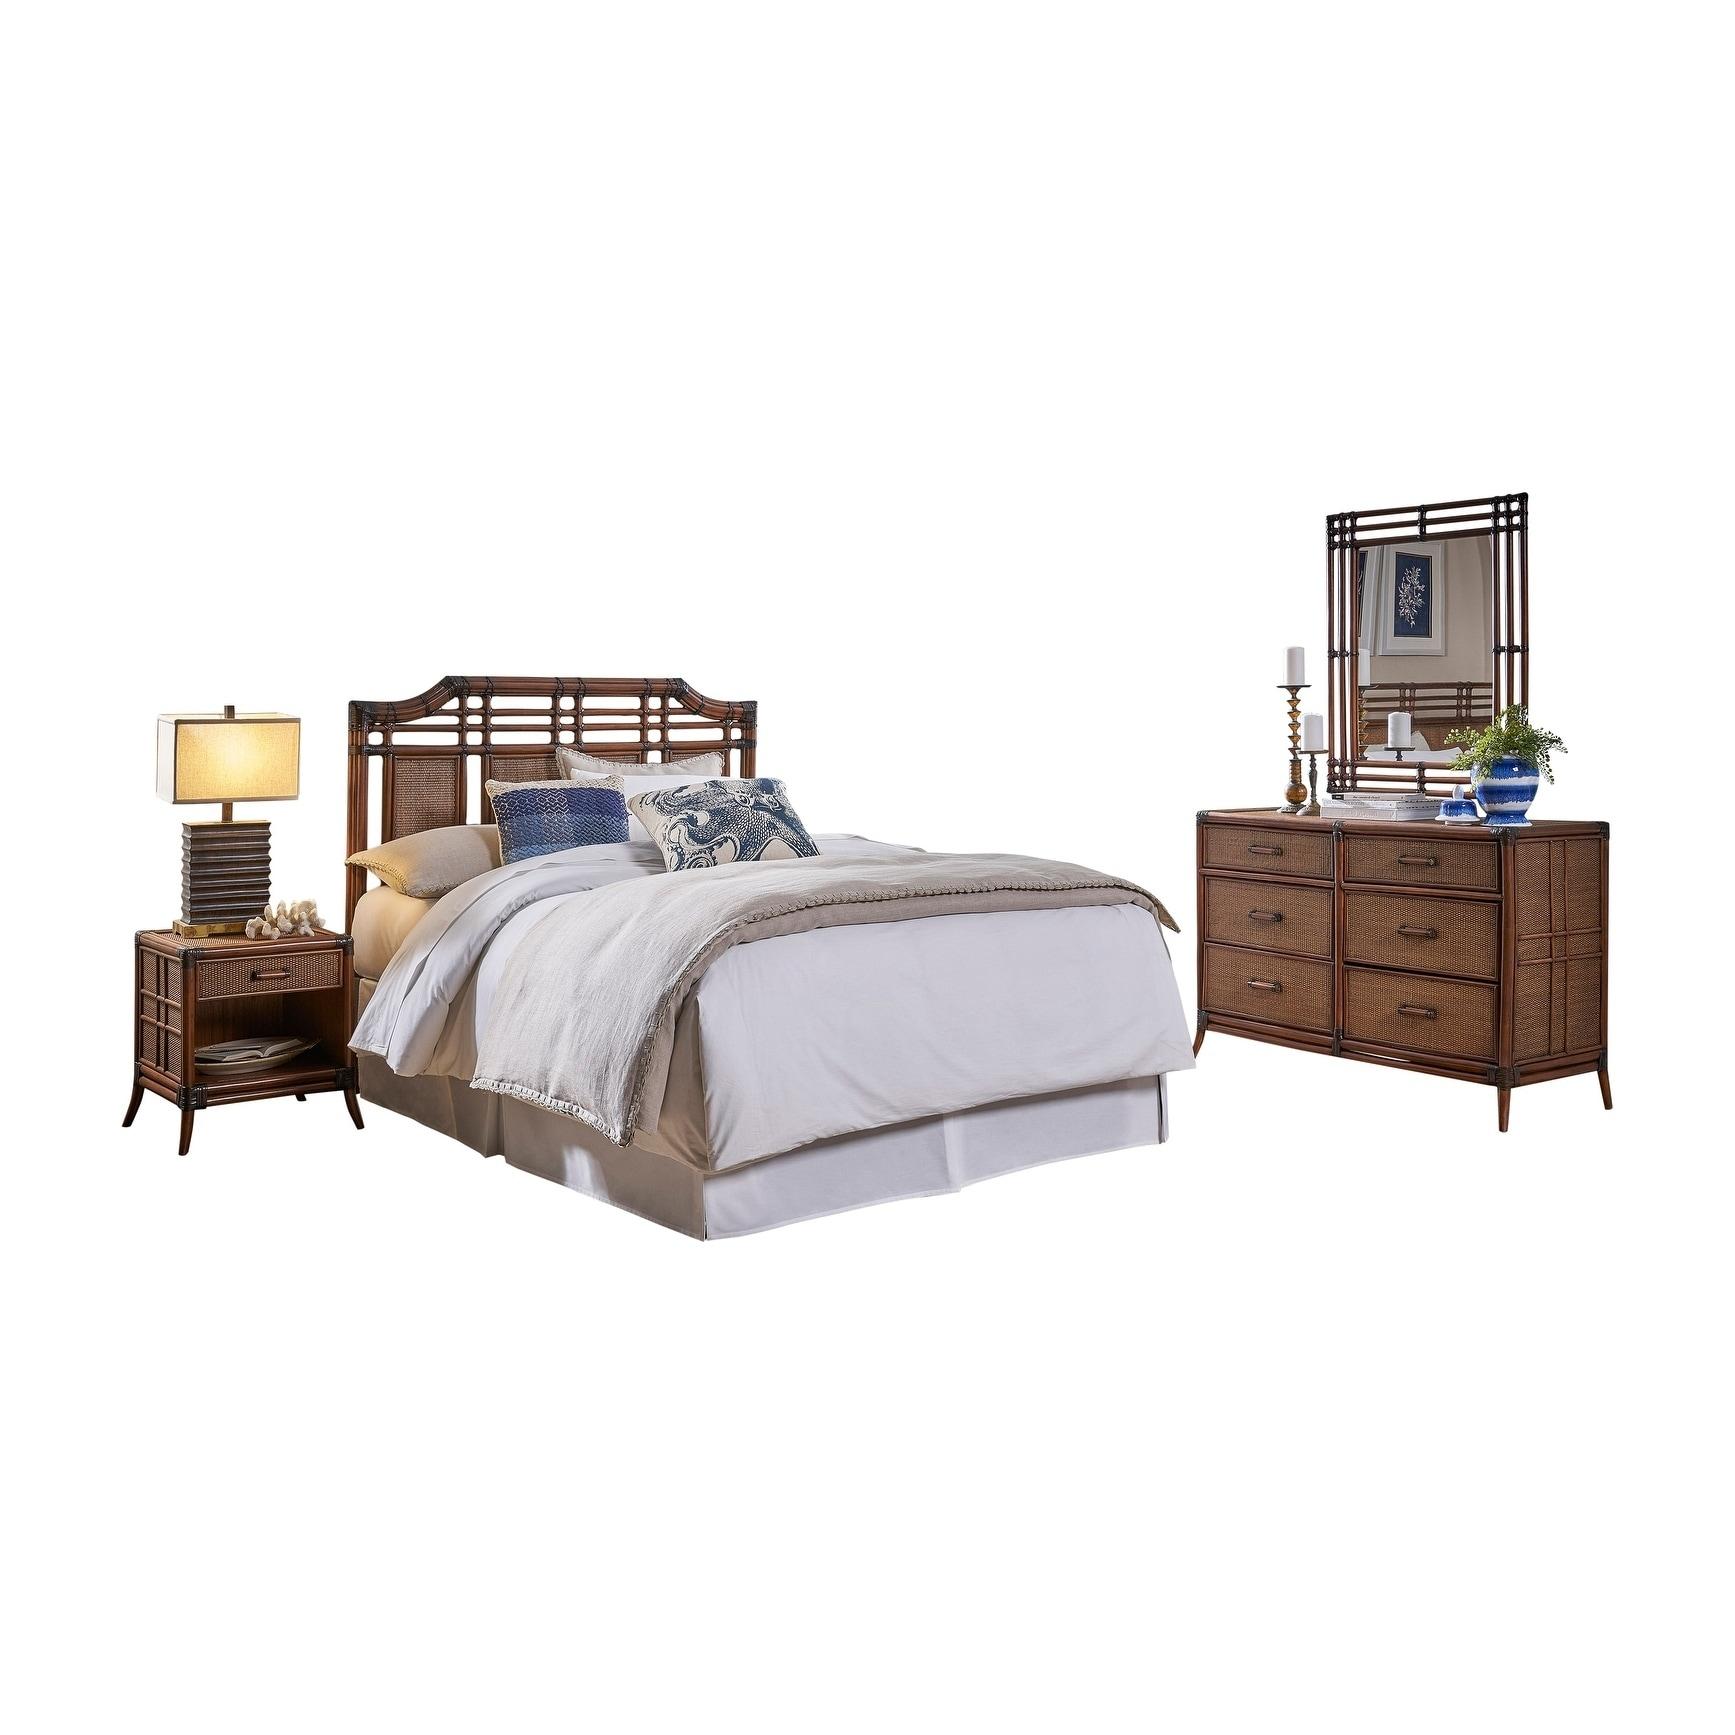 Palm Cove 4 Pc Queen Bedroom Set